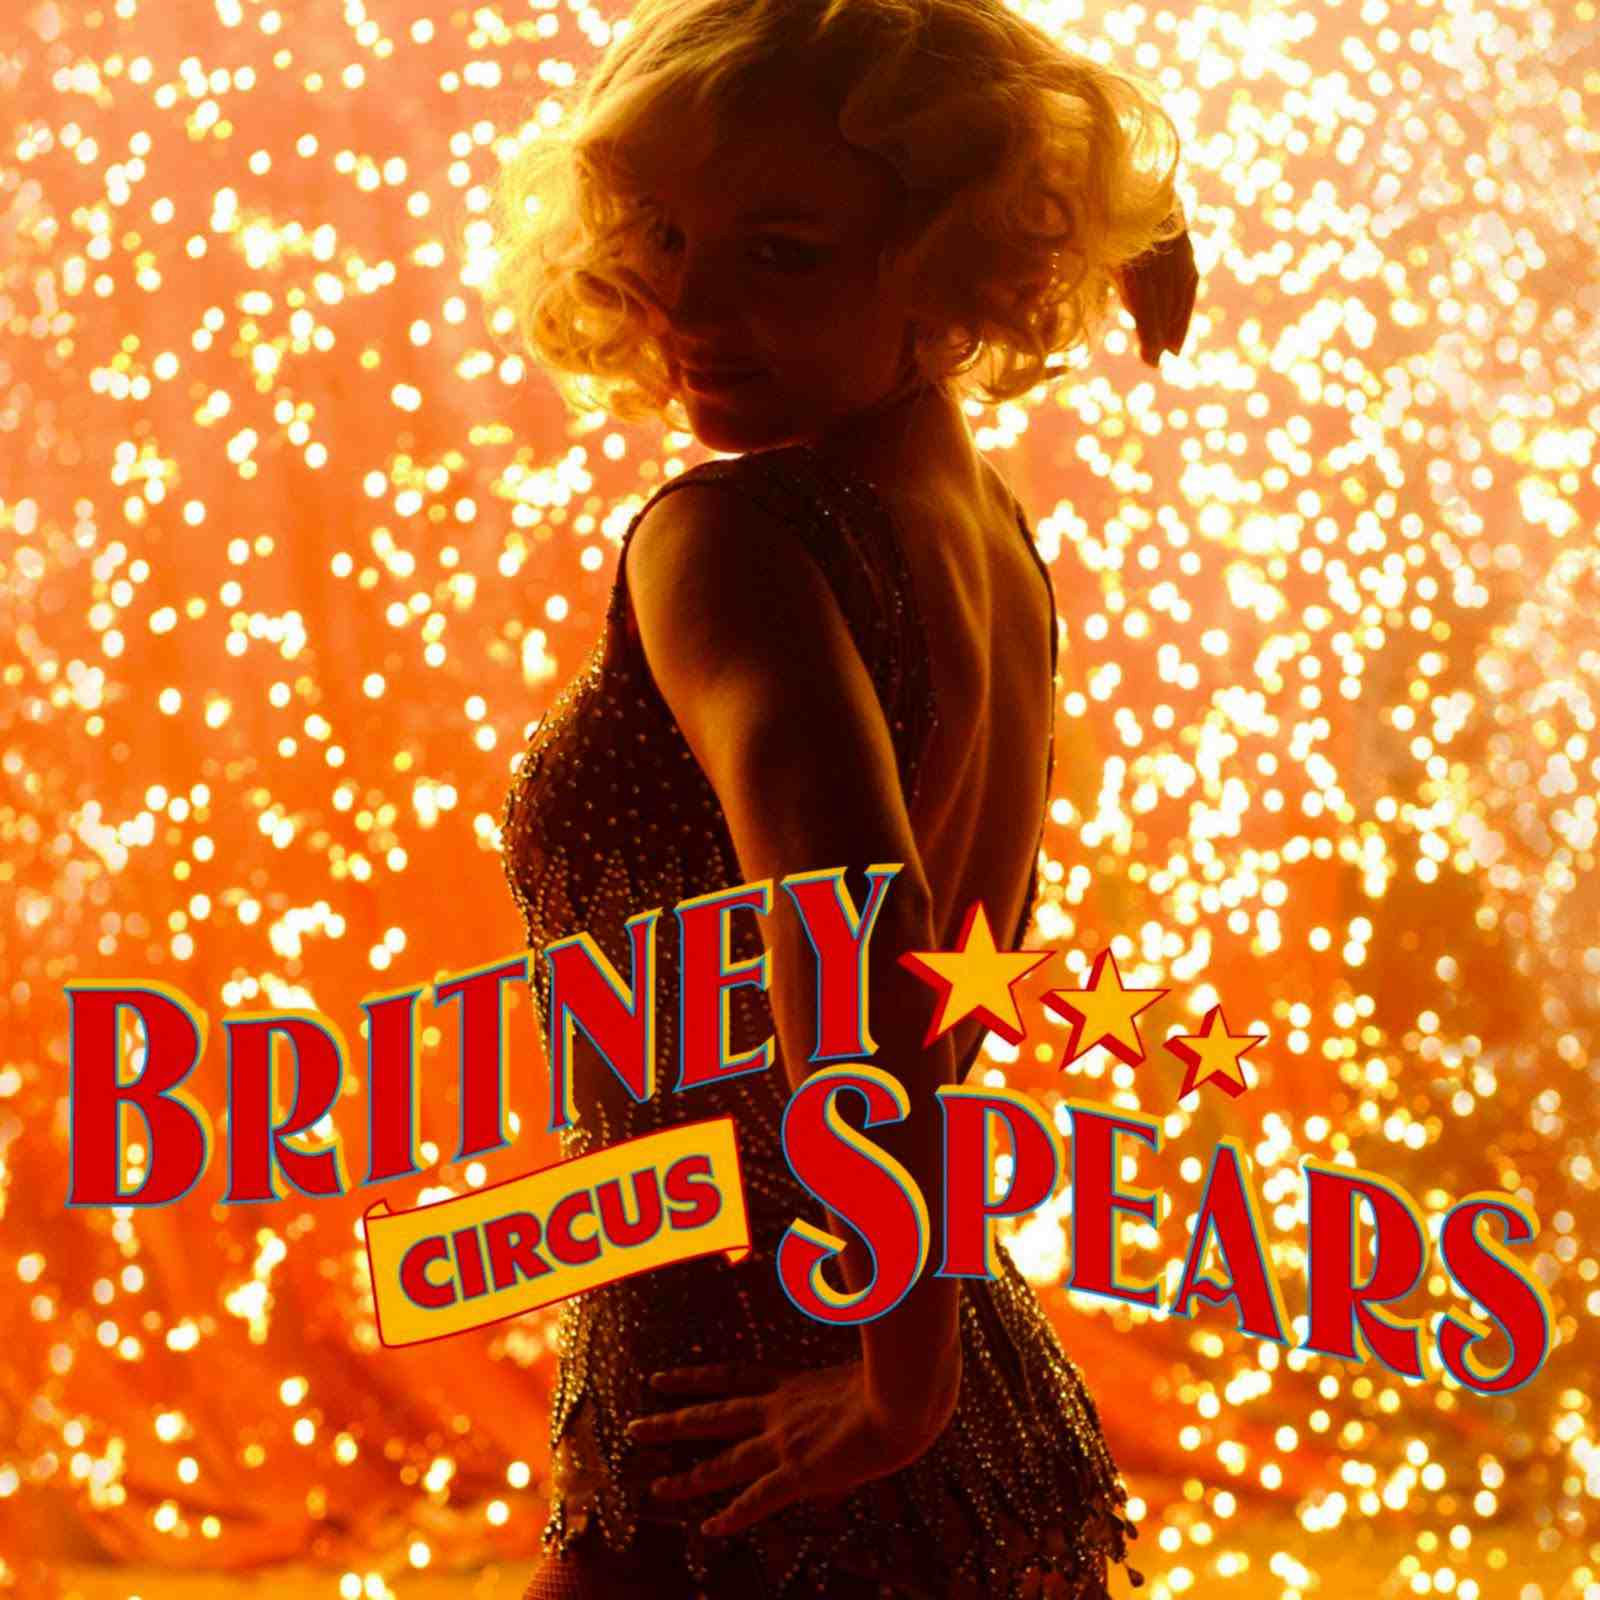 Top 10 First Dance Songs: Top 20 Best Britney Spears Songs